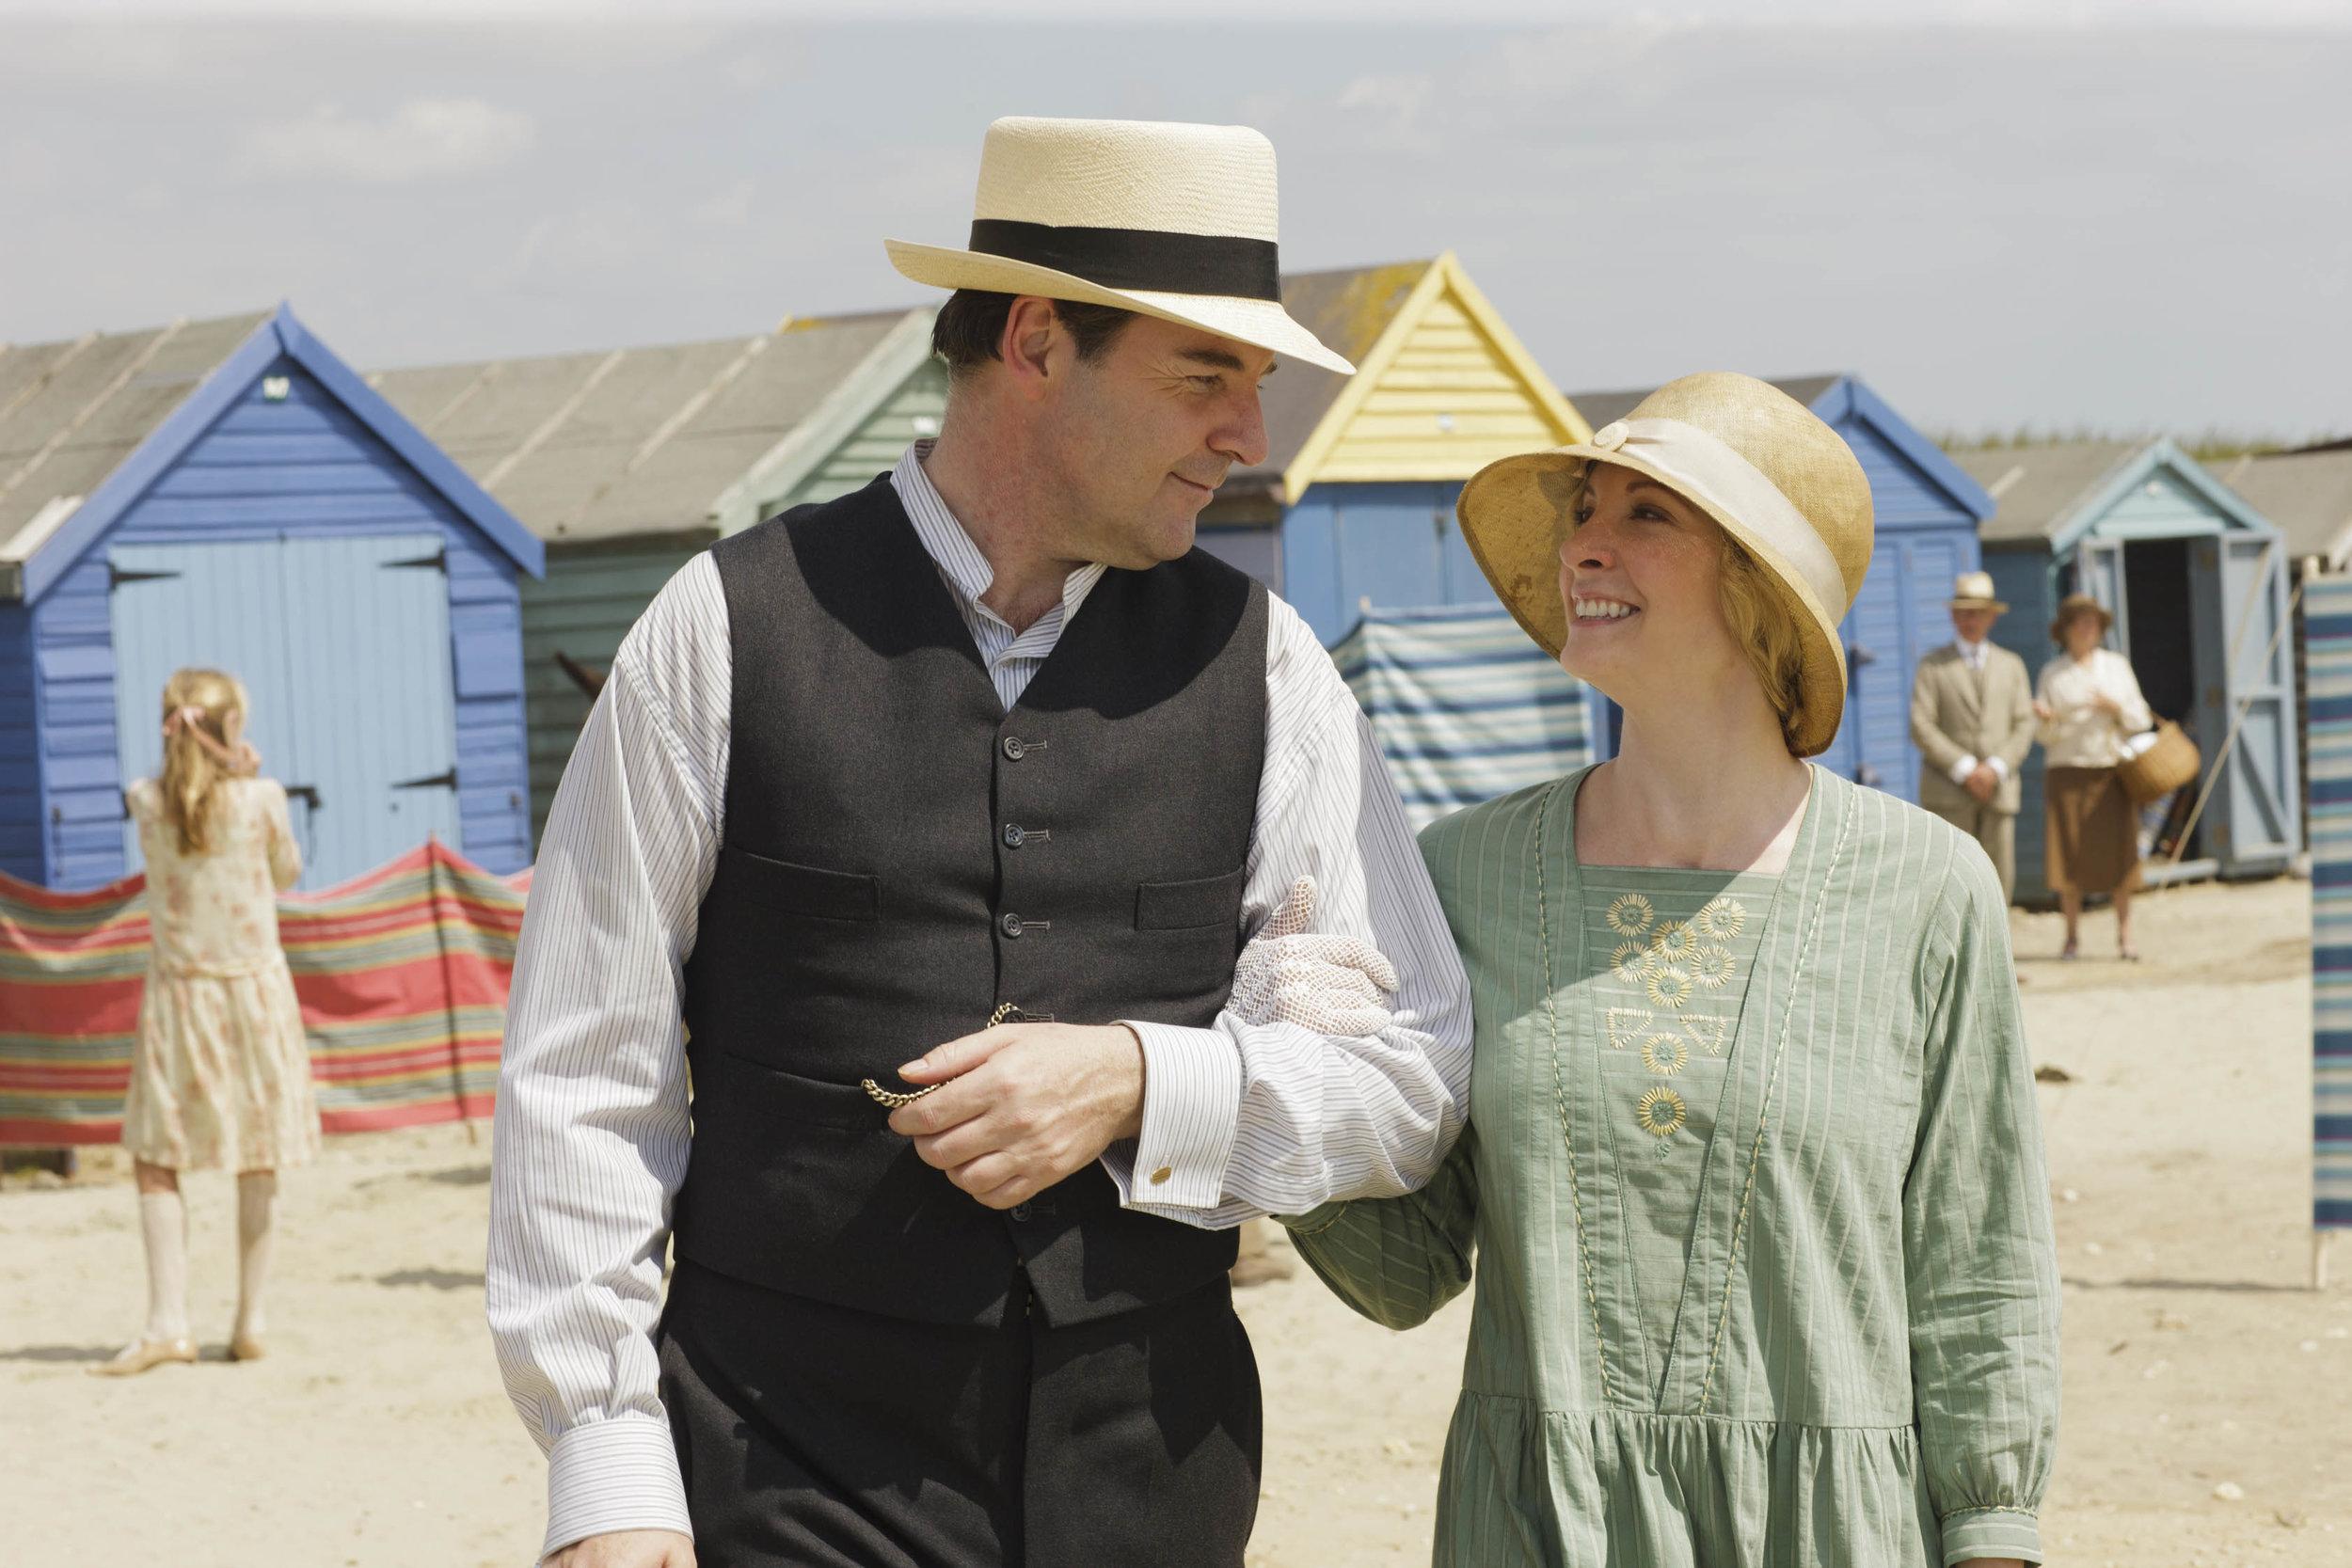 Brendan Coyle and Joanne Froggatt as Mr. and Mrs. Bates